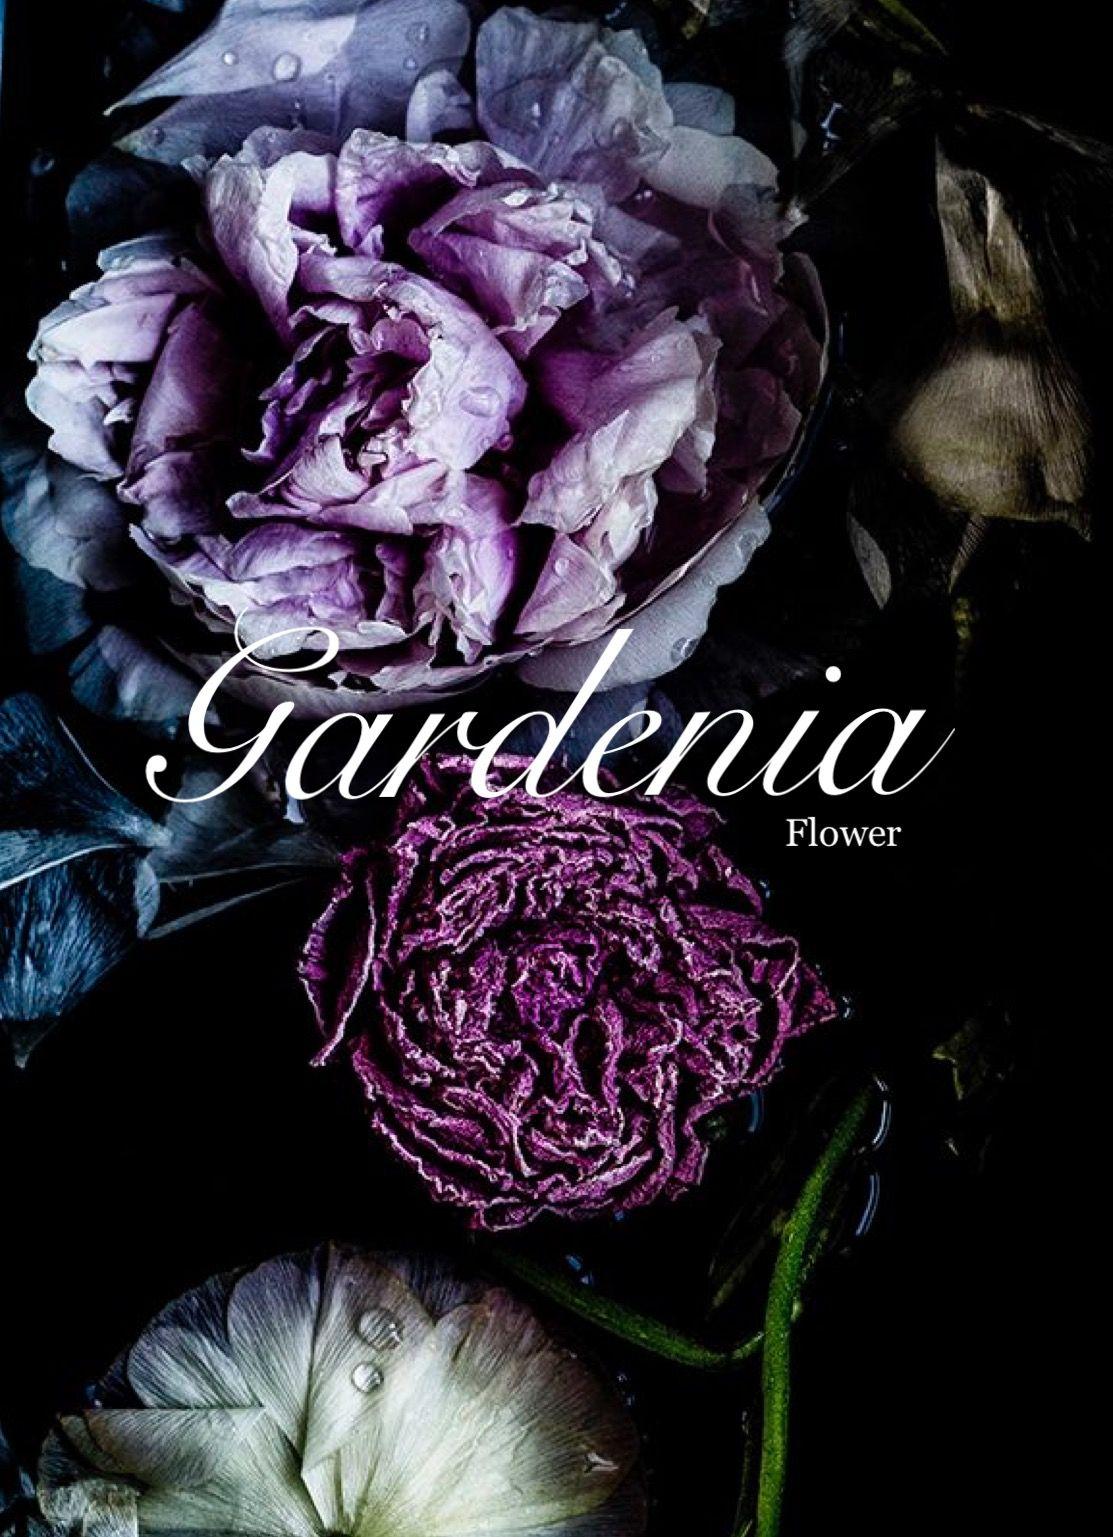 Gardenia Name Girl Names Feminine Names Middle Names Flower Names Uncommon Names Names That Start With G Baby Girl Name Dark Flowers Dark Floral Floral